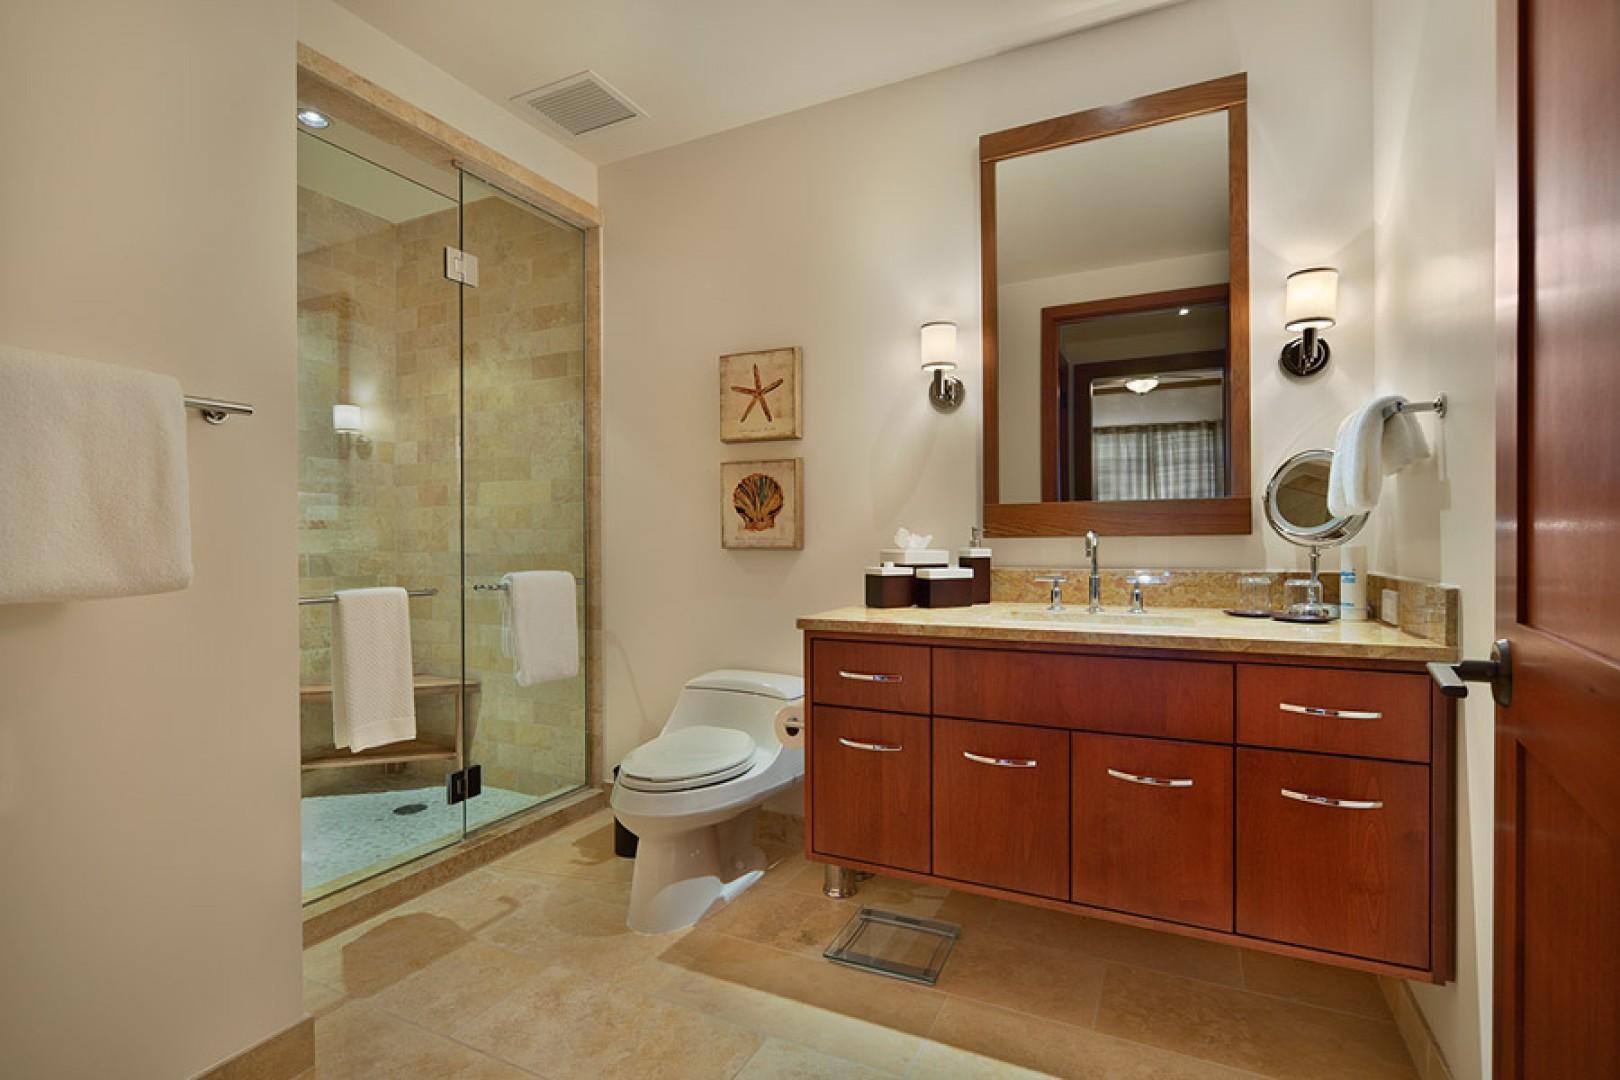 Sea Mist Villa 2403 - Bedroom Three Bath with Glass Enclosed Walk-in Shower, Make up mirror, Hair dryer, Scale